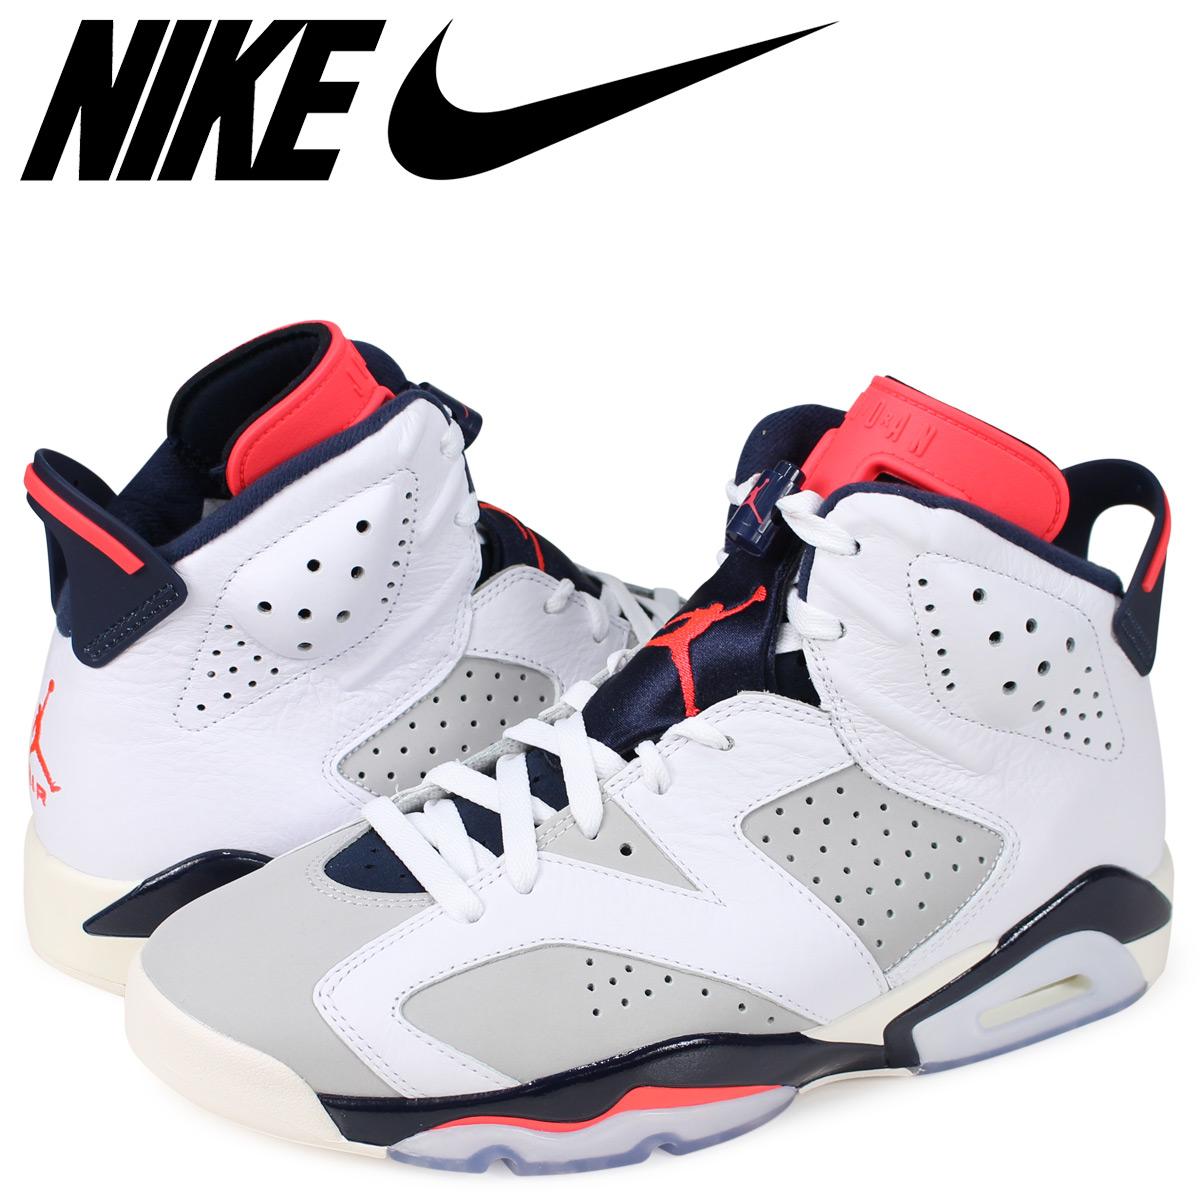 detailed look ea9e5 d12fe NIKE AIR JORDAN 6 RETRO TINKER Nike Air Jordan 6 nostalgic sneakers men  white 384,664-104